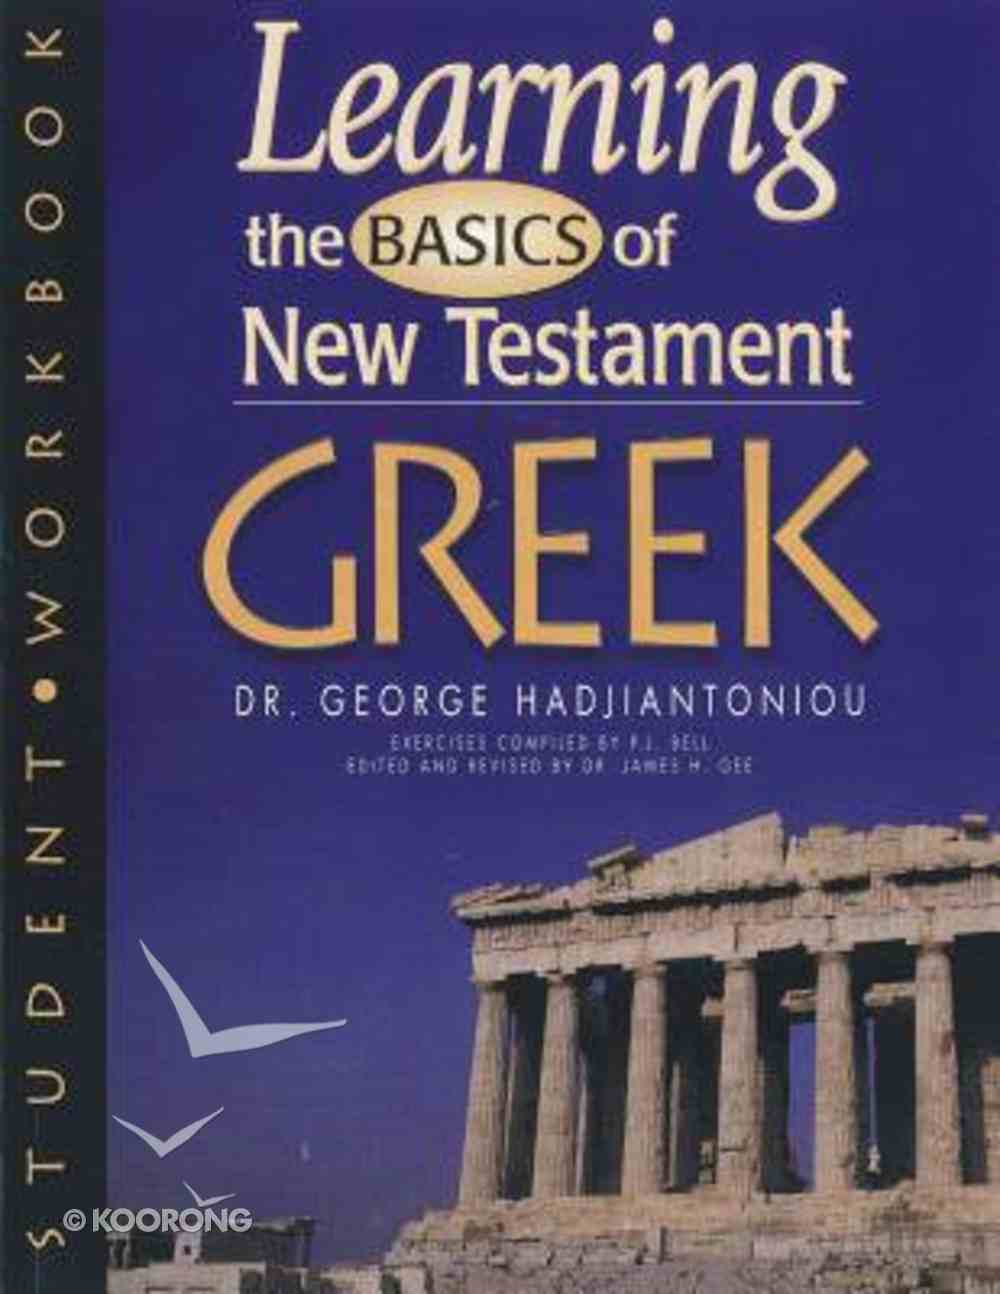 Learning the Basics of New Testament Greek (Workbook) Paperback